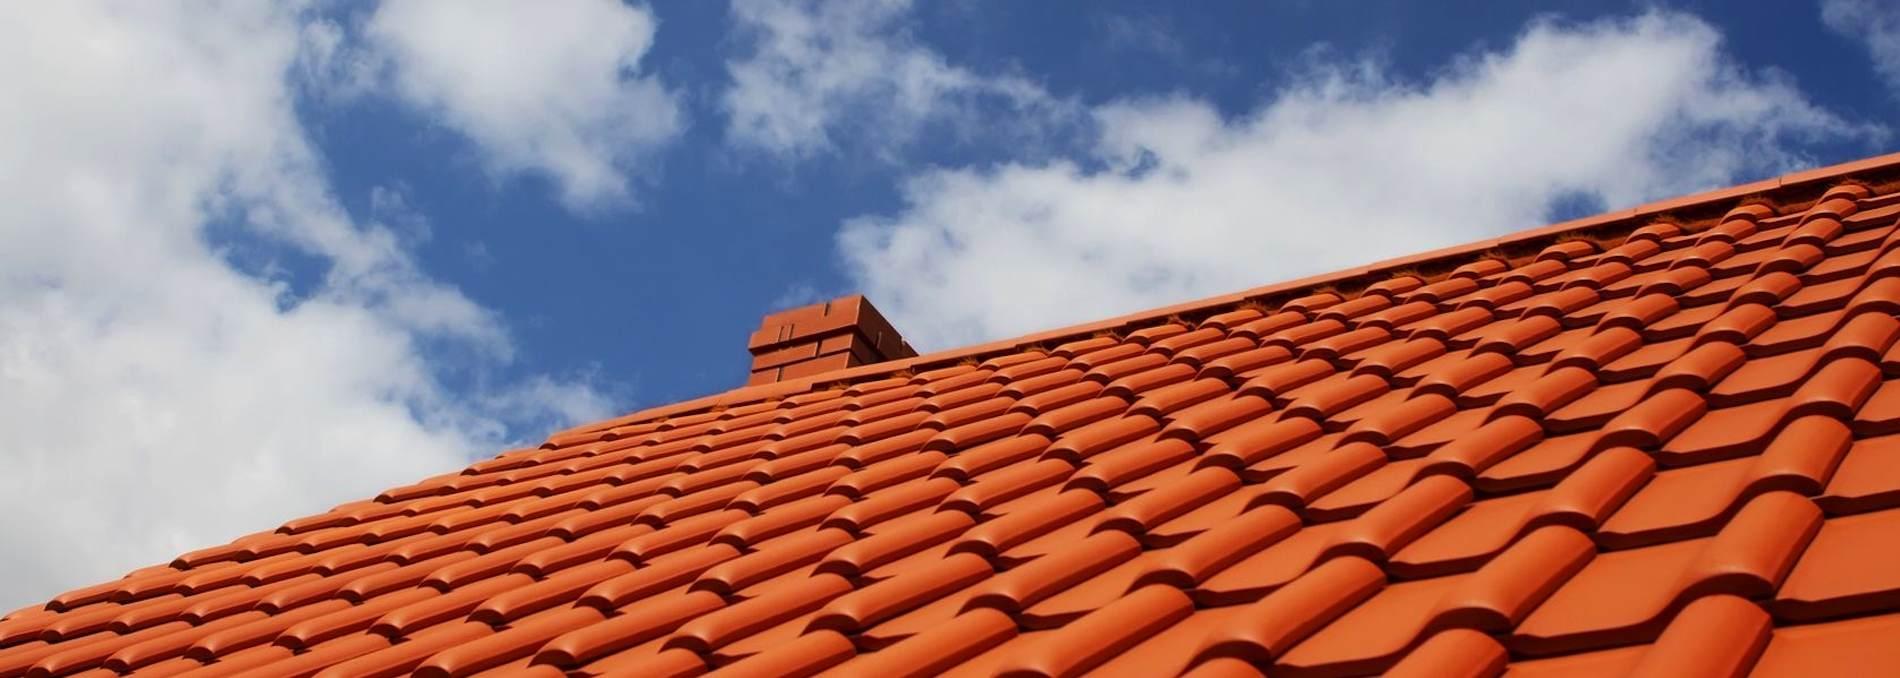 NorthwestRoof Restoration (@northwestroof) Cover Image